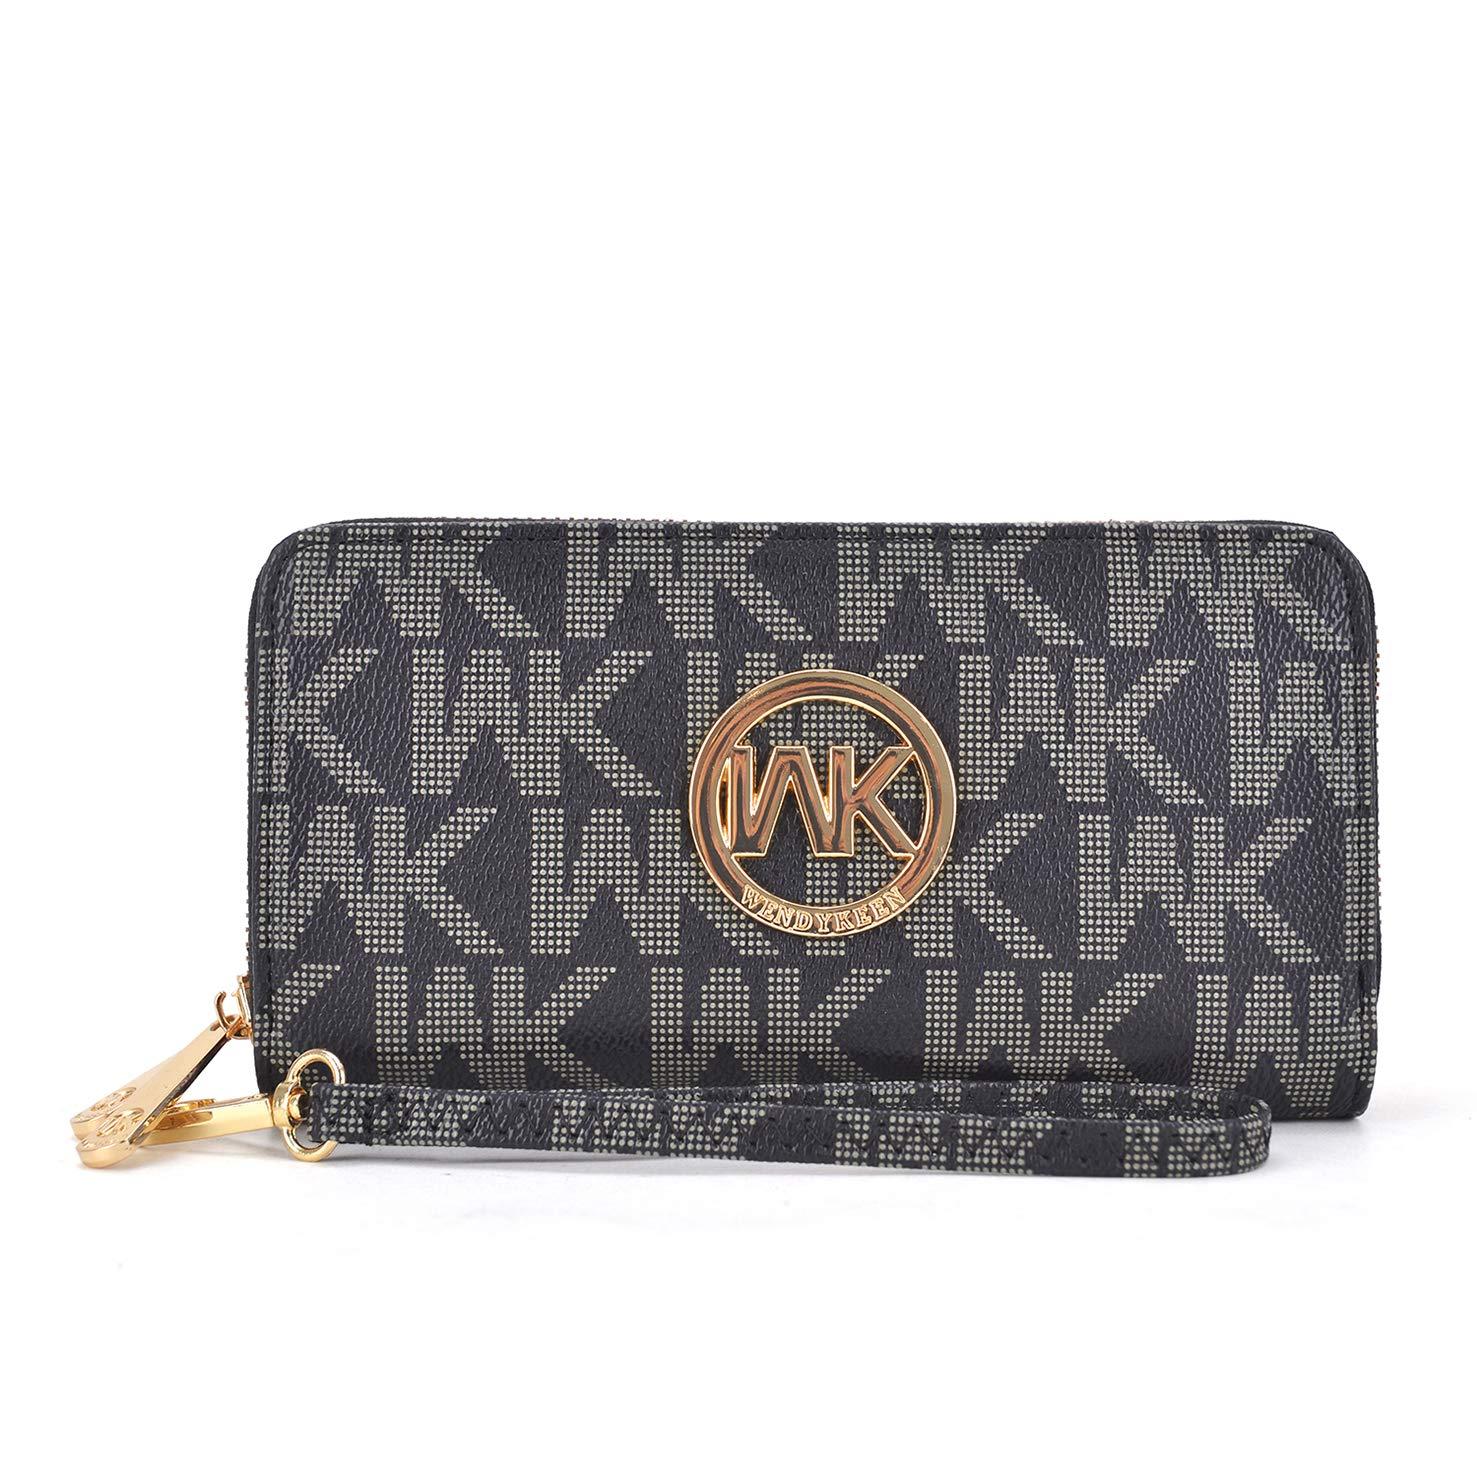 Wallets for Women, Soft PU Leather Double Zipper Around Multi Card Organizer Roomy Vintage Lady Clutch (WK-K908-BK)